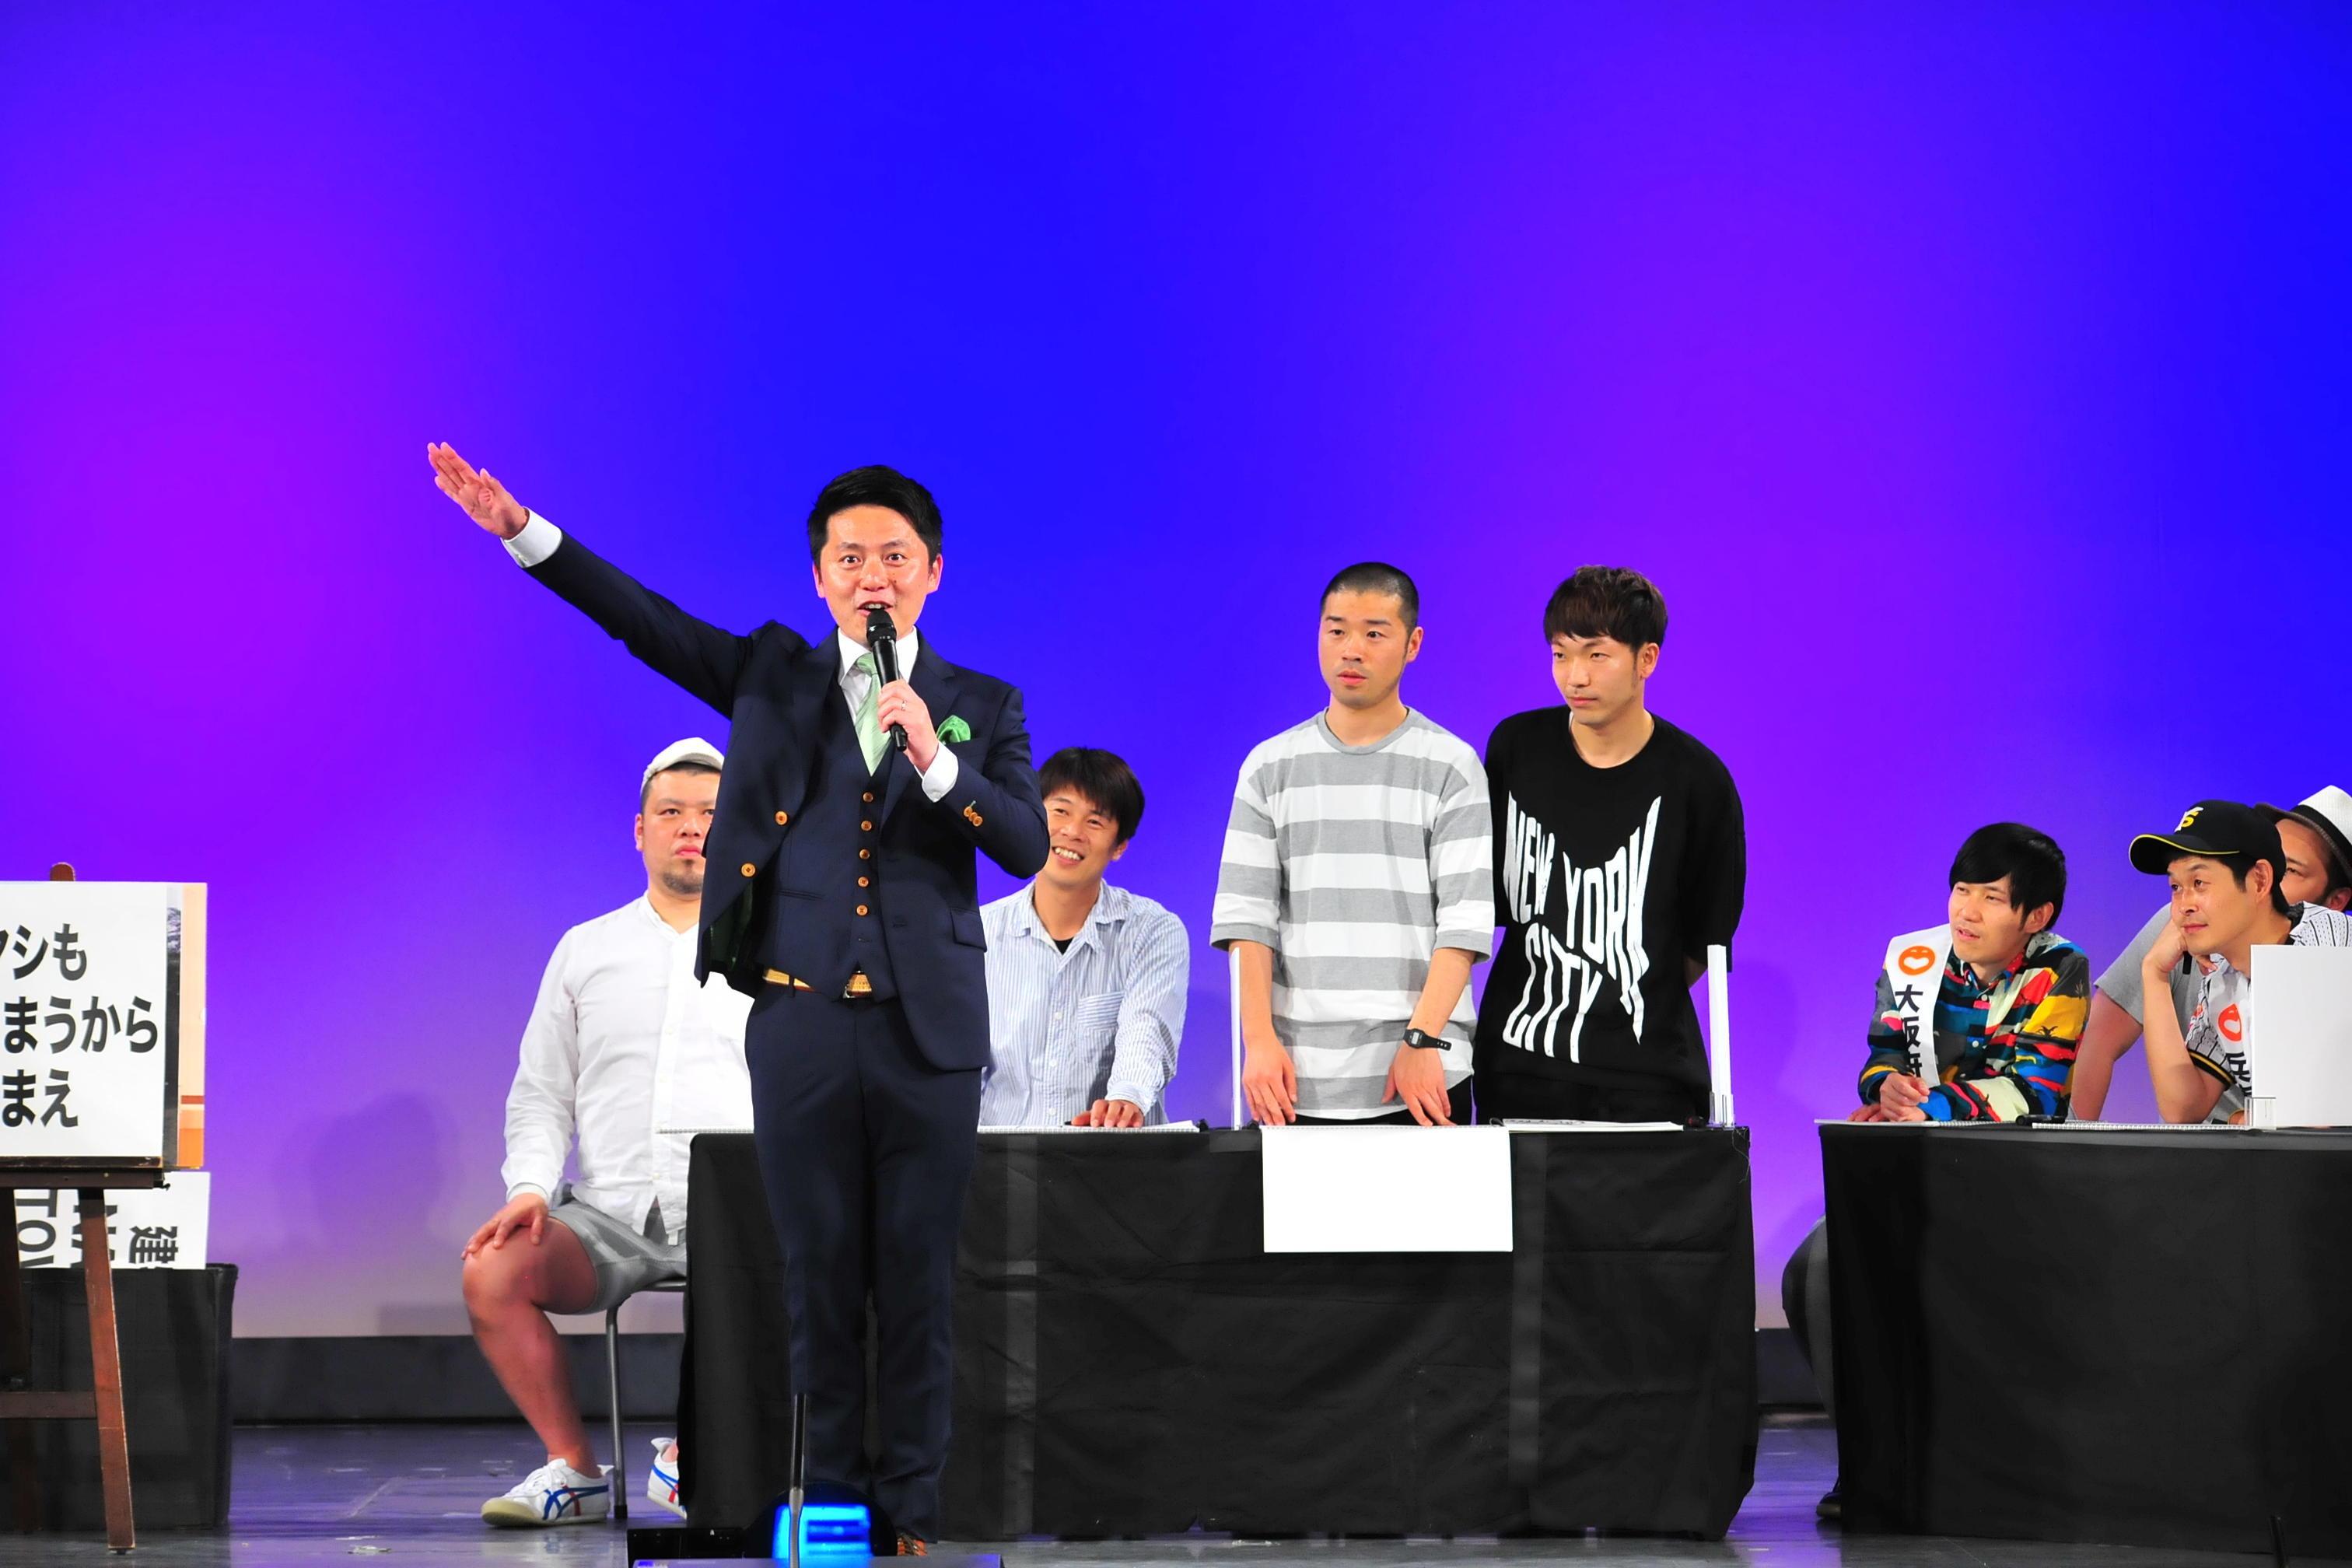 http://news.yoshimoto.co.jp/20160516144608-44ead8f75e5f9763d3c79761b94a0dc5c9dab19f.jpg